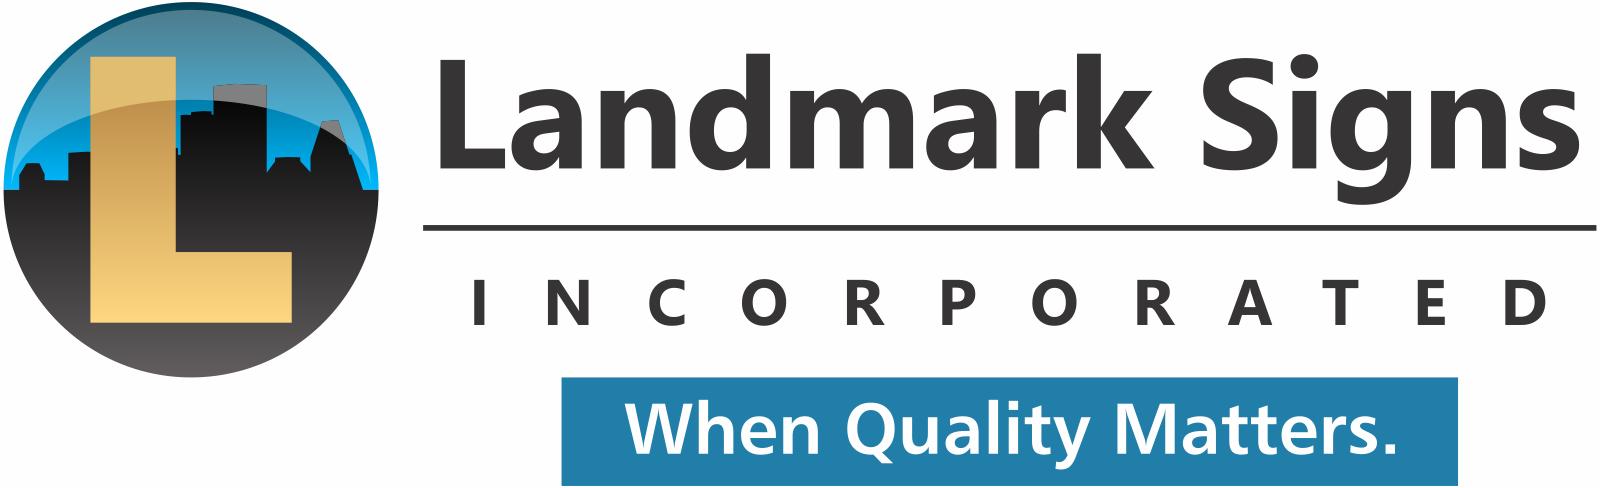 landmarksignsincblog